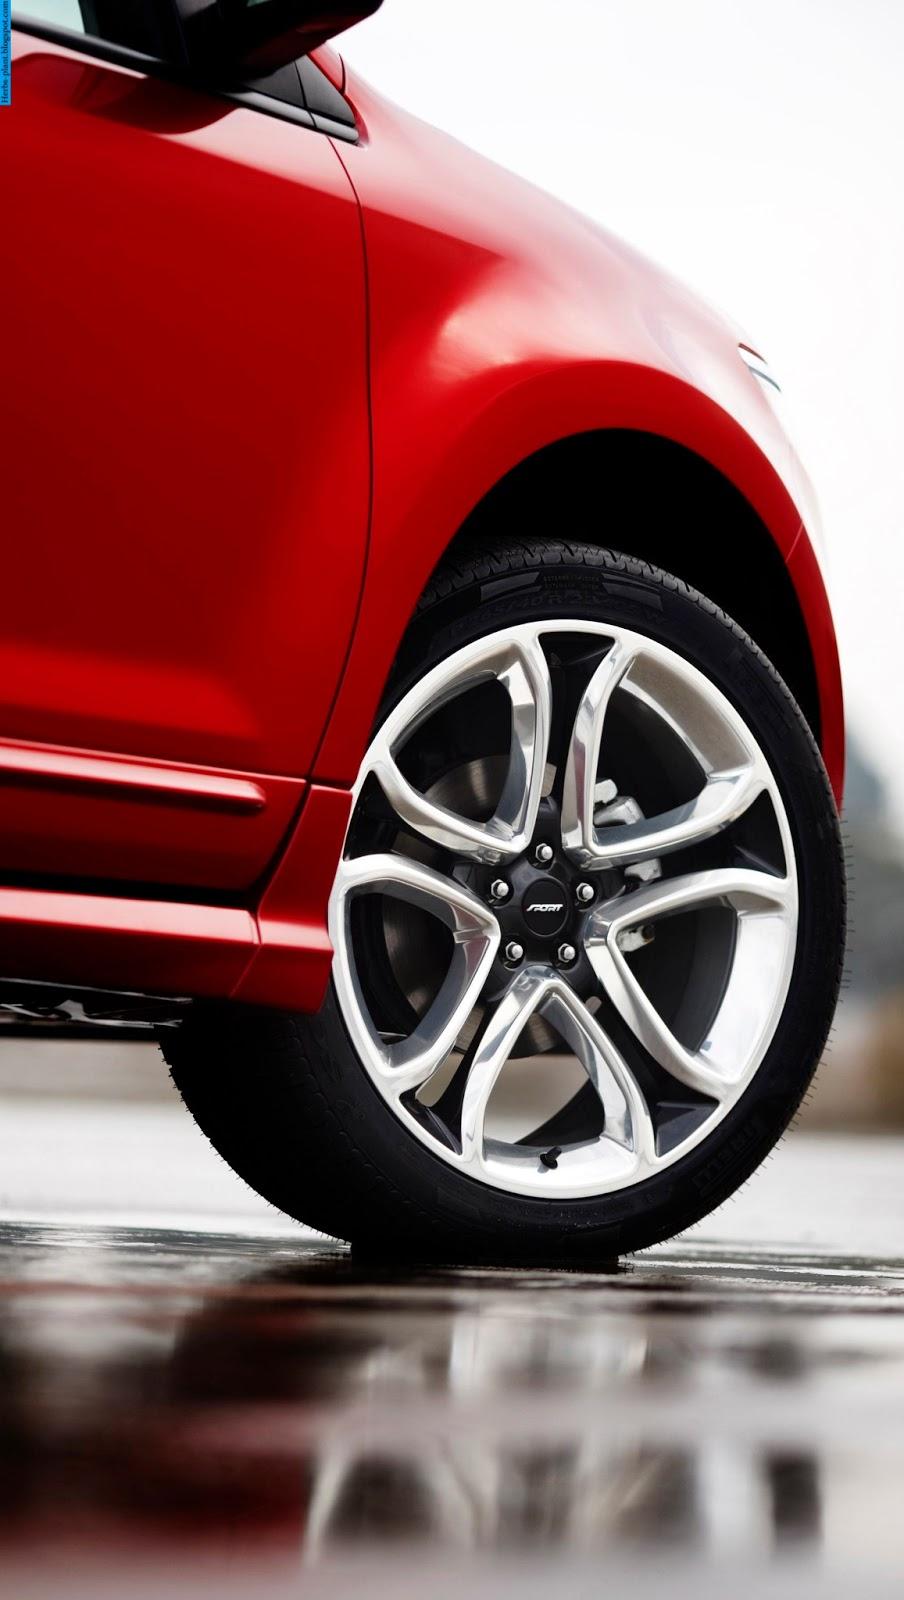 Ford edge car 2013 tyres/wheels - صور اطارات سيارة فورد ايدج 2013